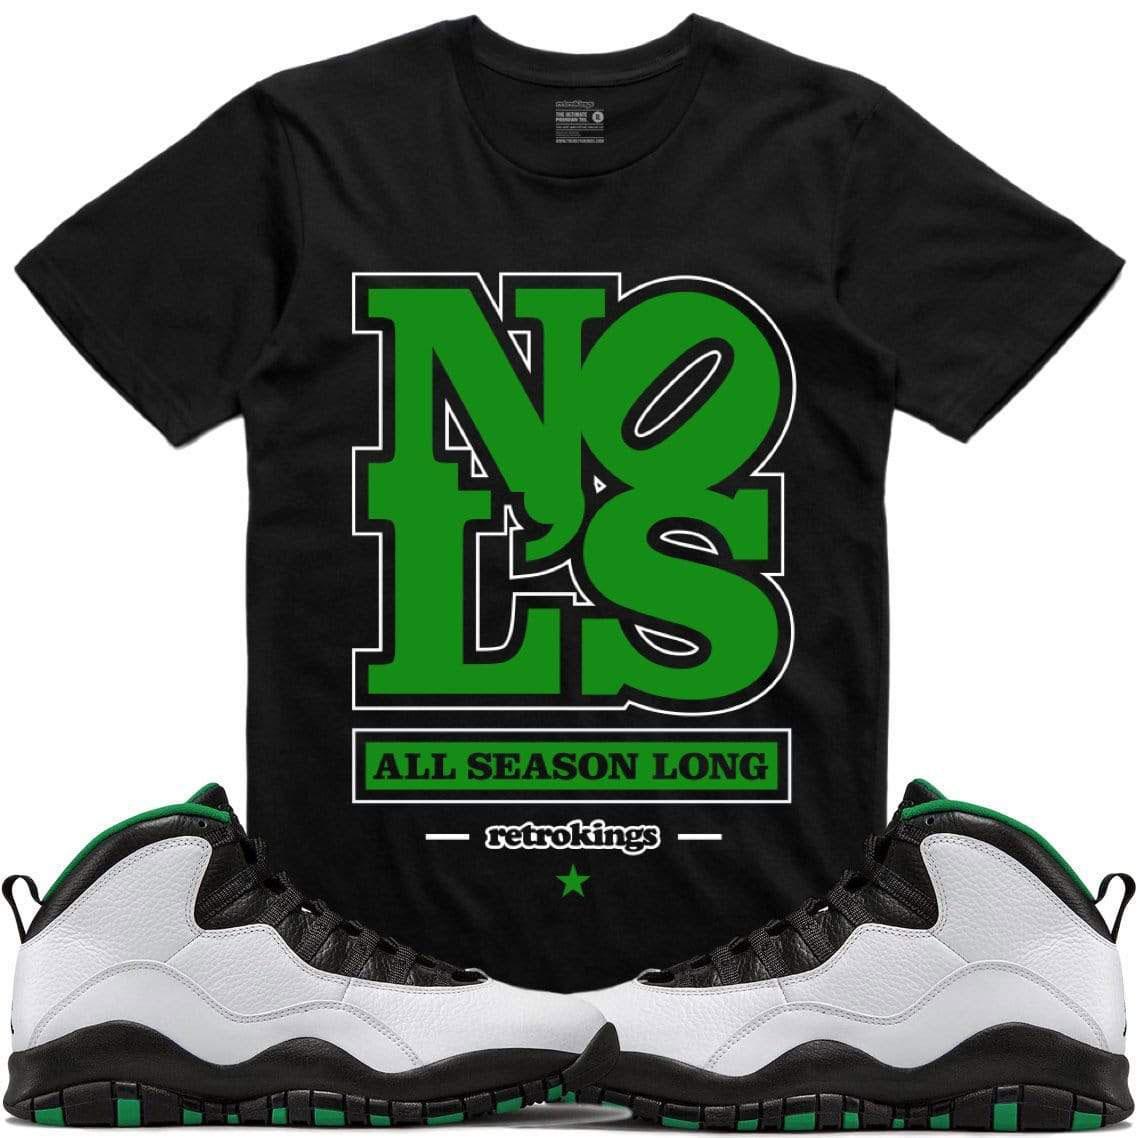 jordan-10-seattle-sneaker-shirts-retro-kings-7